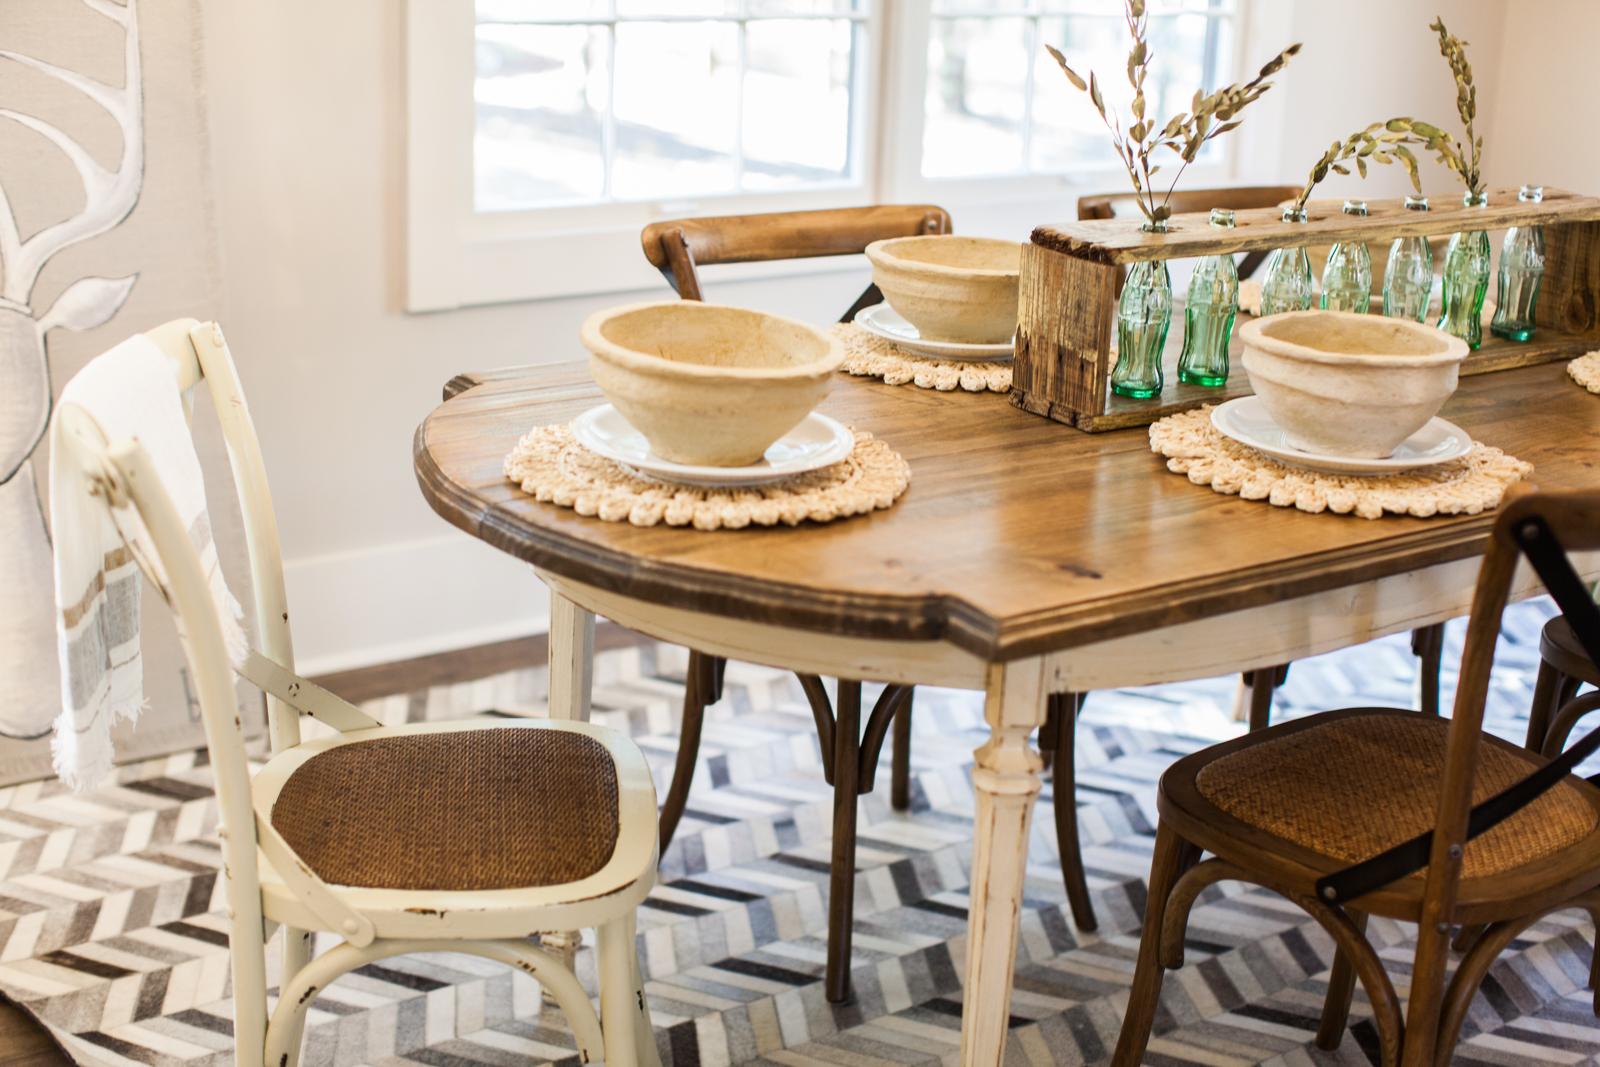 Custom Dining Table and Bottle Display: Junc2Funkt, Staging: Urban Farmhouse, Flooring: Tarkett, Lighting: Savoy House